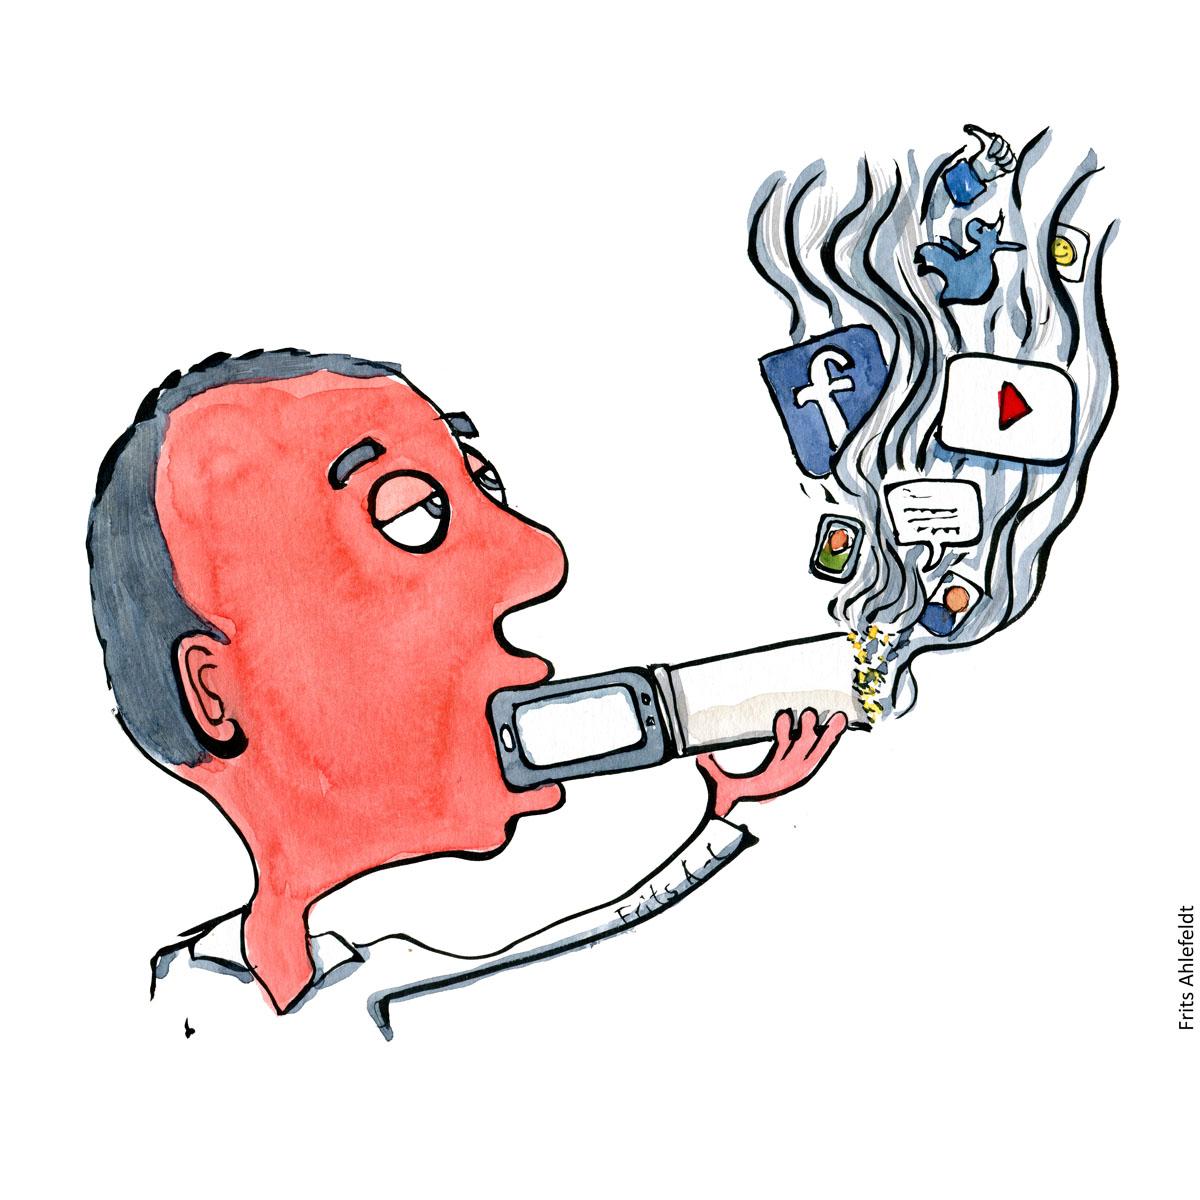 Illustration-digital addict-drawing - drawn journalism by Frits Ahlefeldt